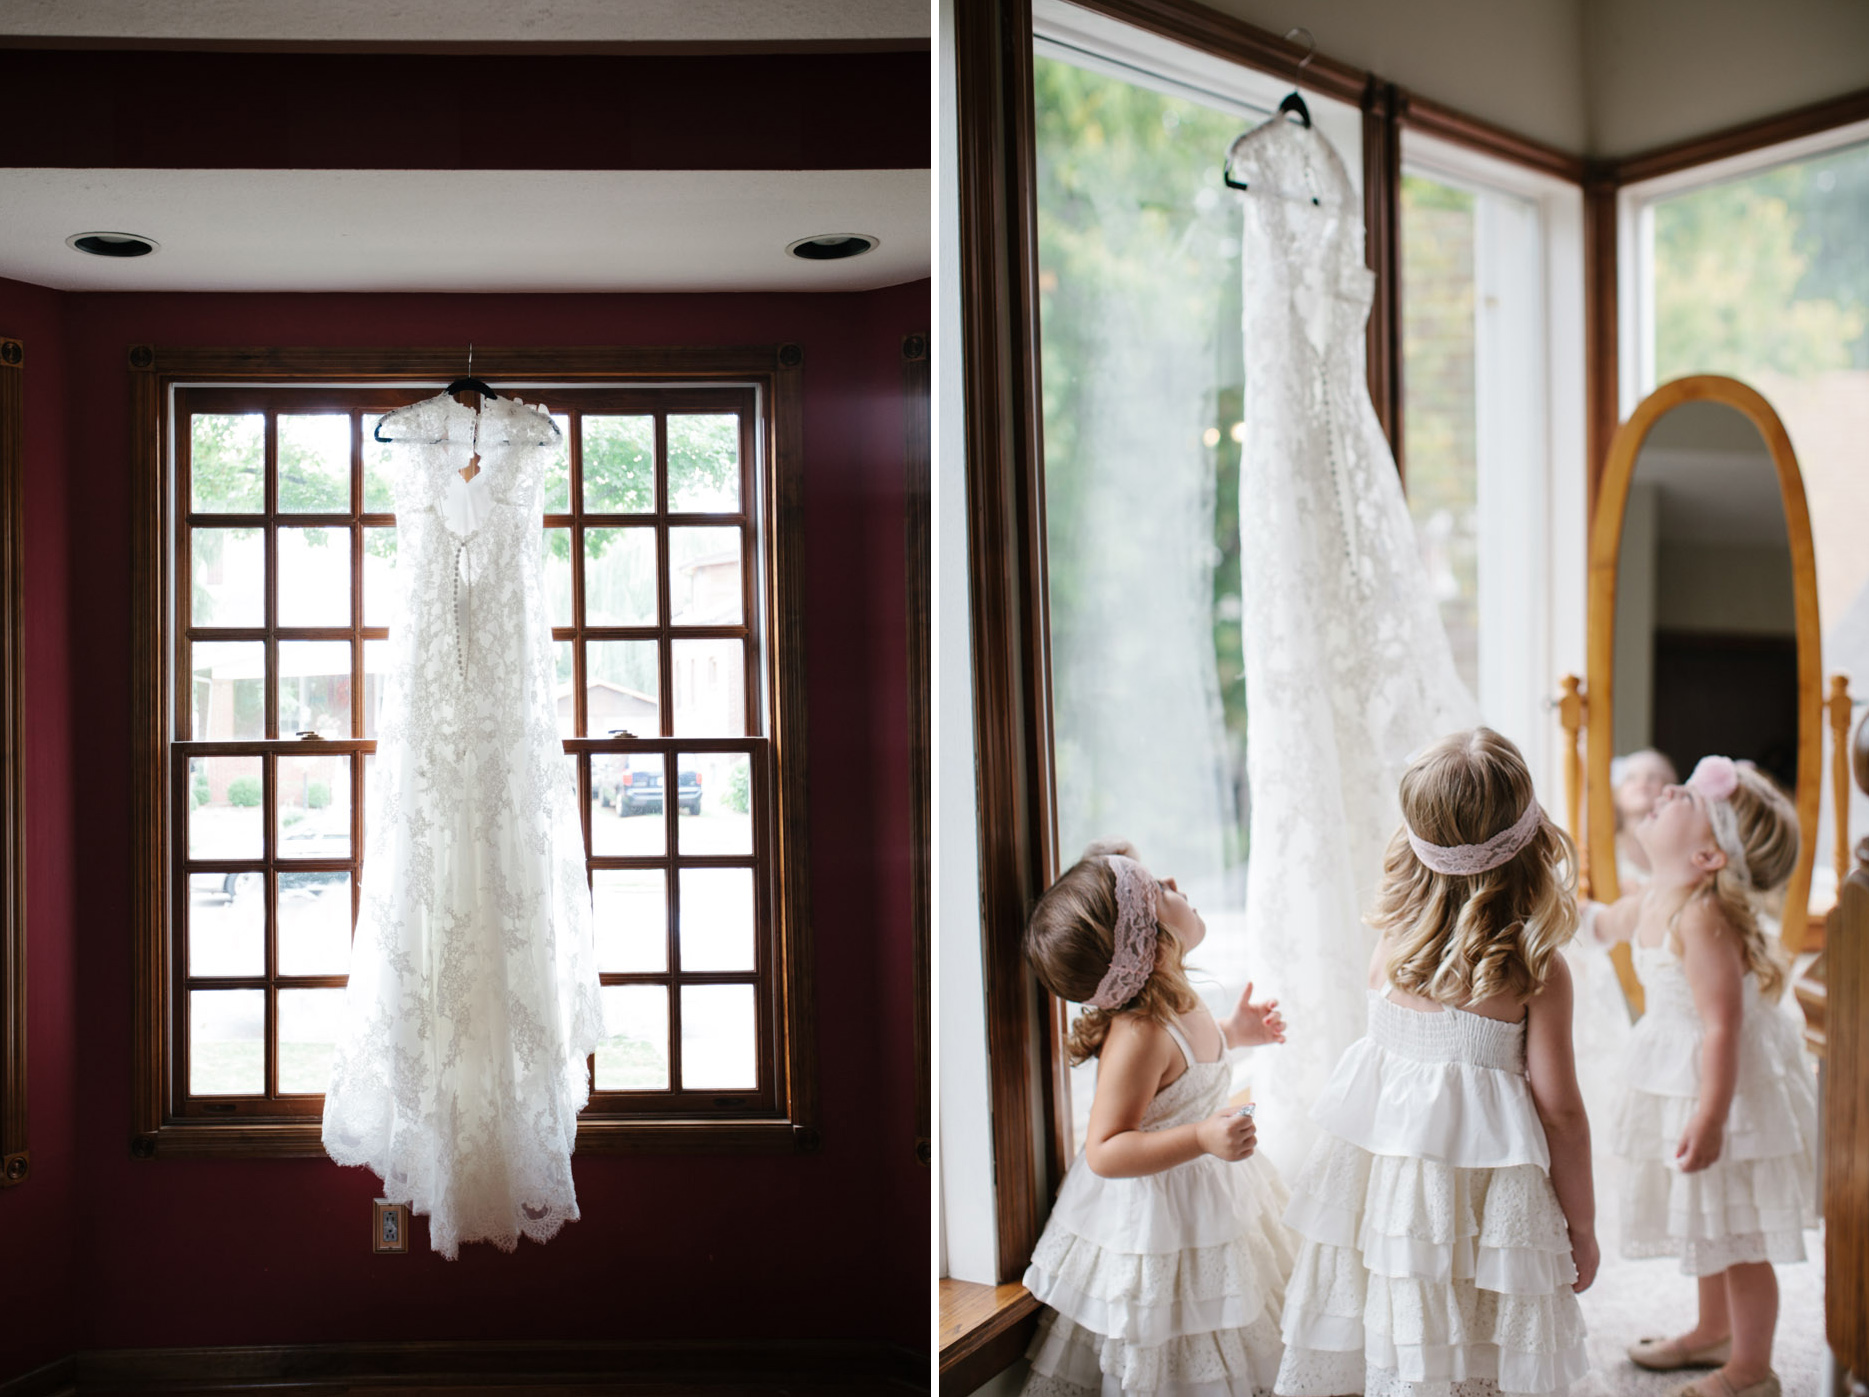 St-Louis-Wedding-Photography-1012-copy.jpg